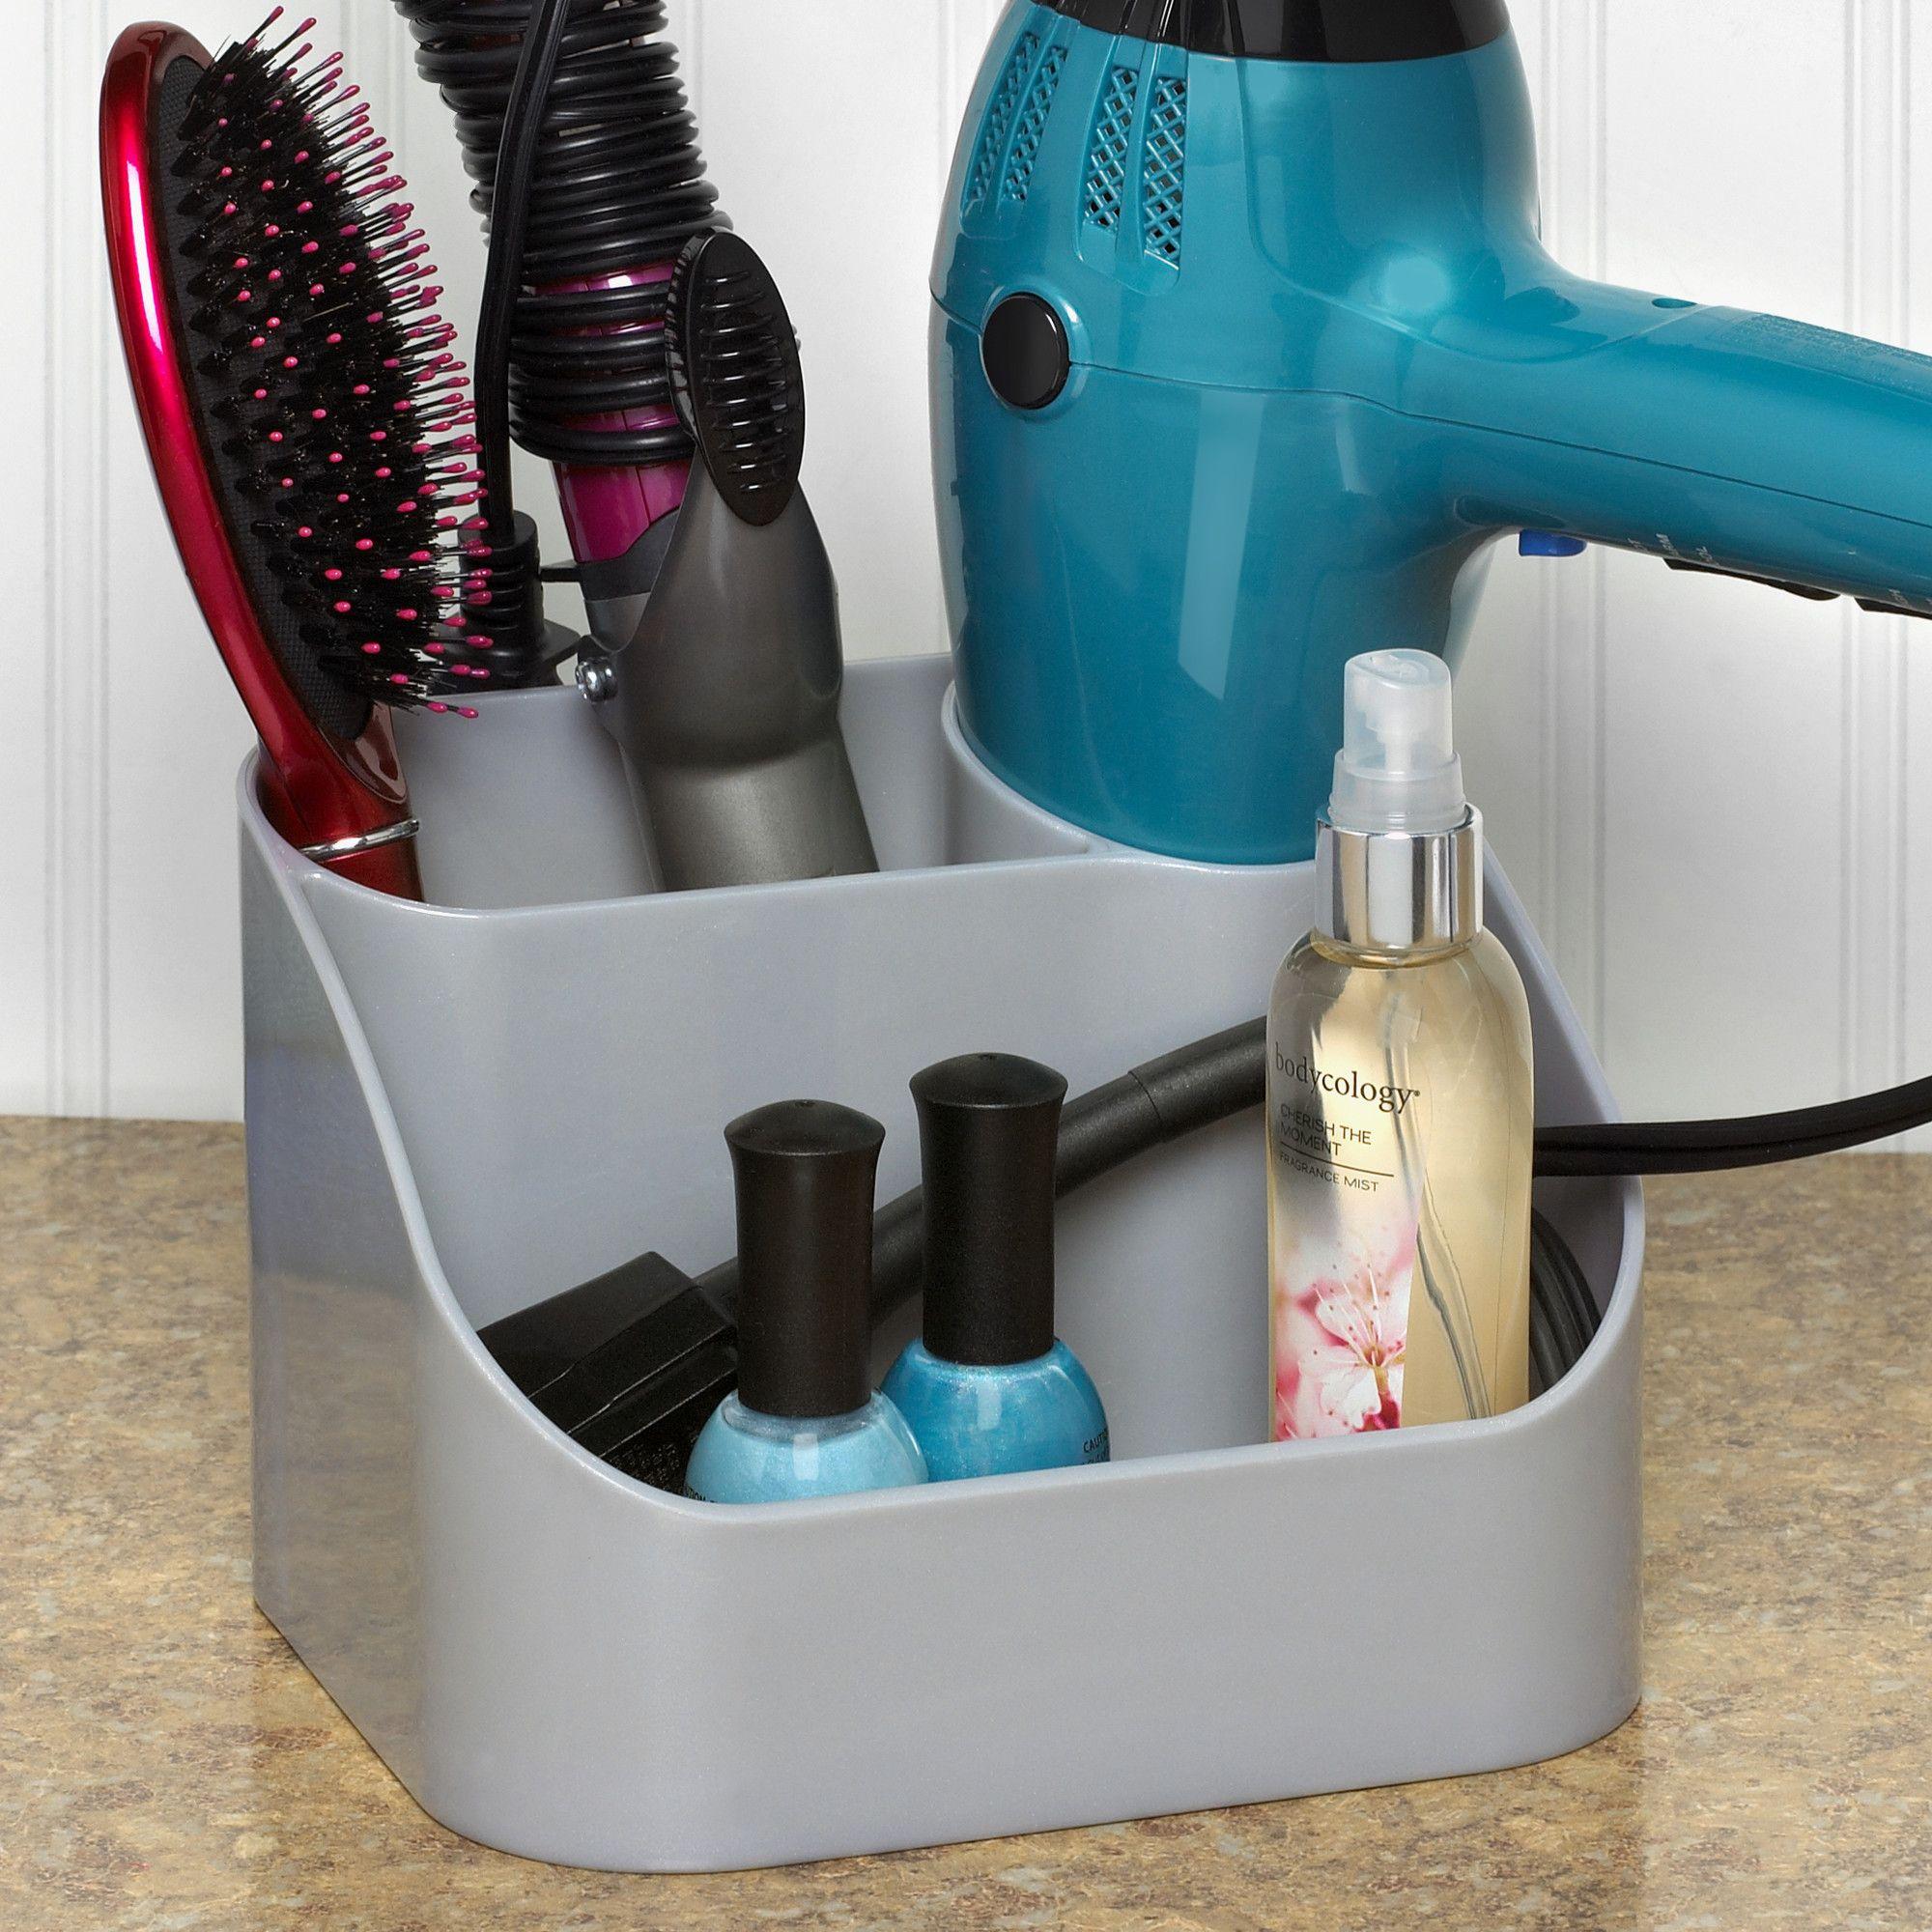 Contour Countertop Hair Care Caddy   Products   Pinterest   Spectrum ...